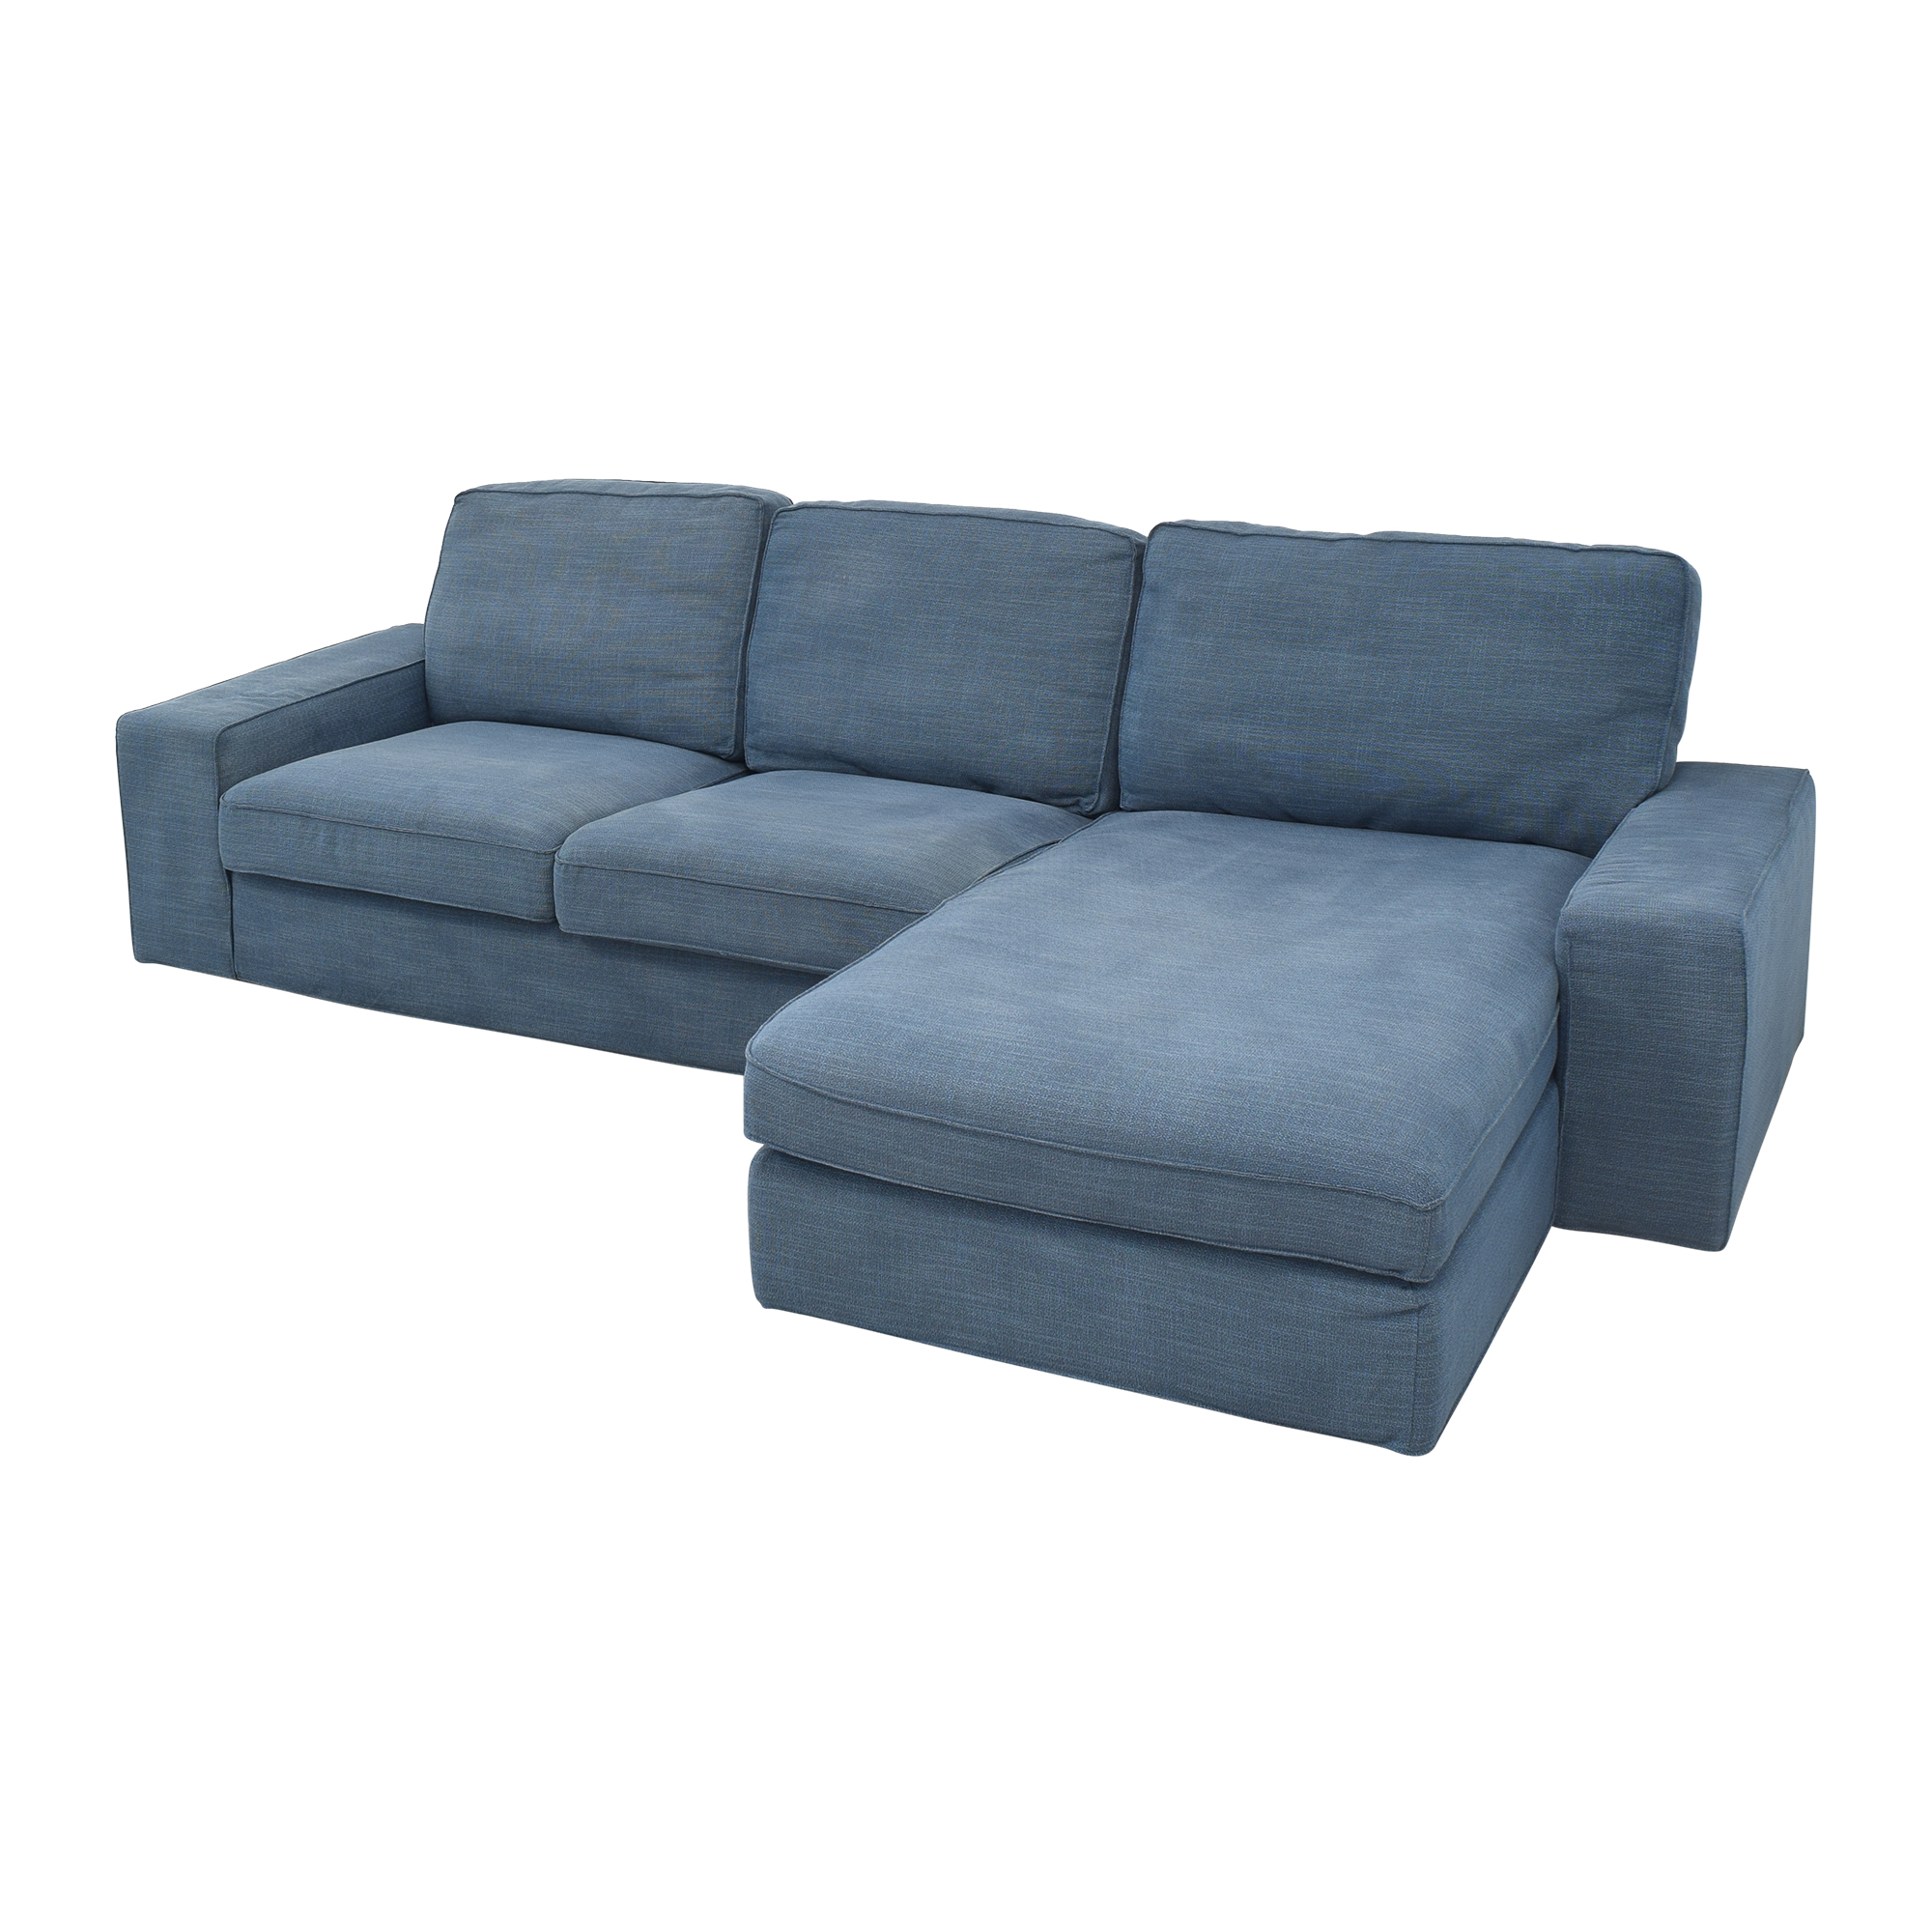 IKEA IKEA Kivik Sofa with Chaise ma